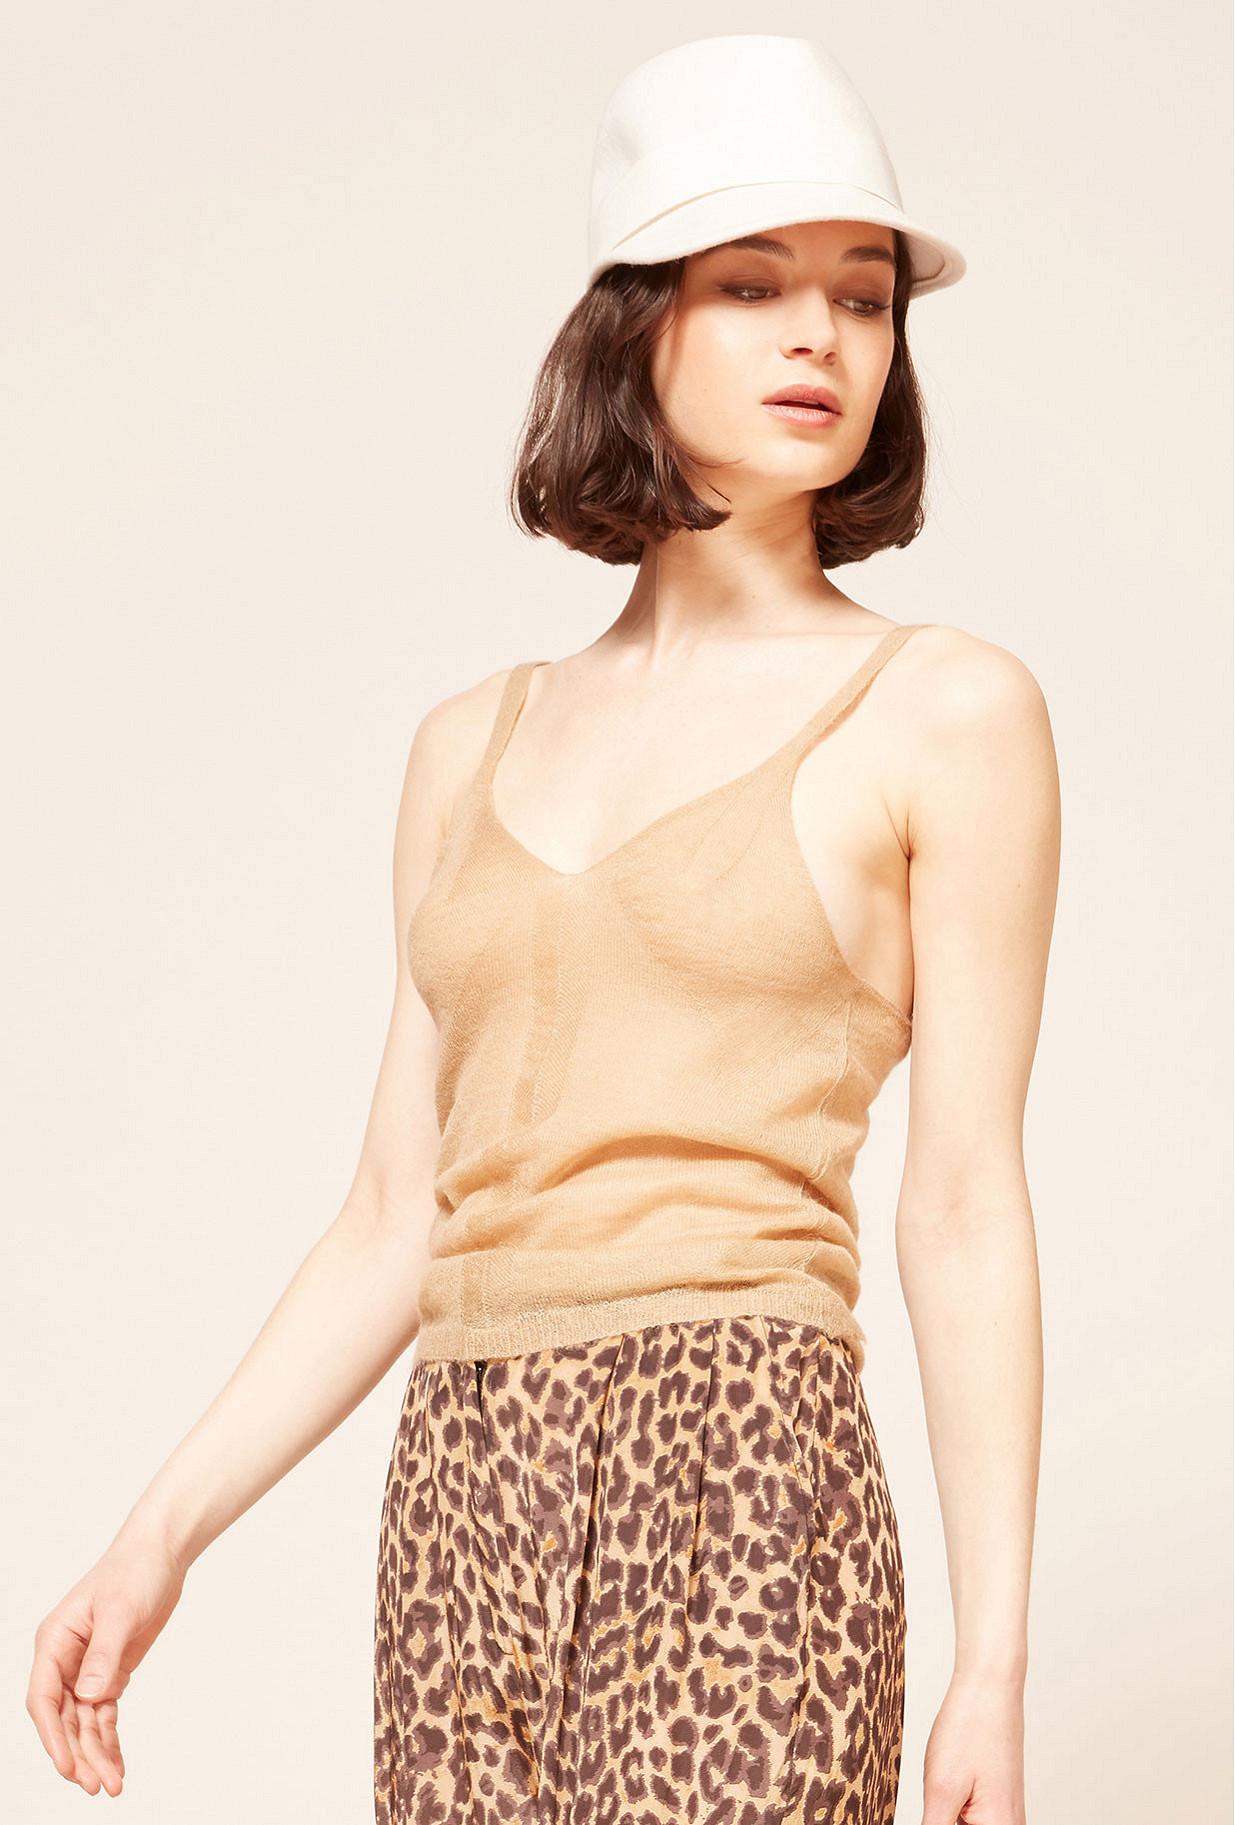 Paris clothes store Top  Sintero french designer fashion Paris